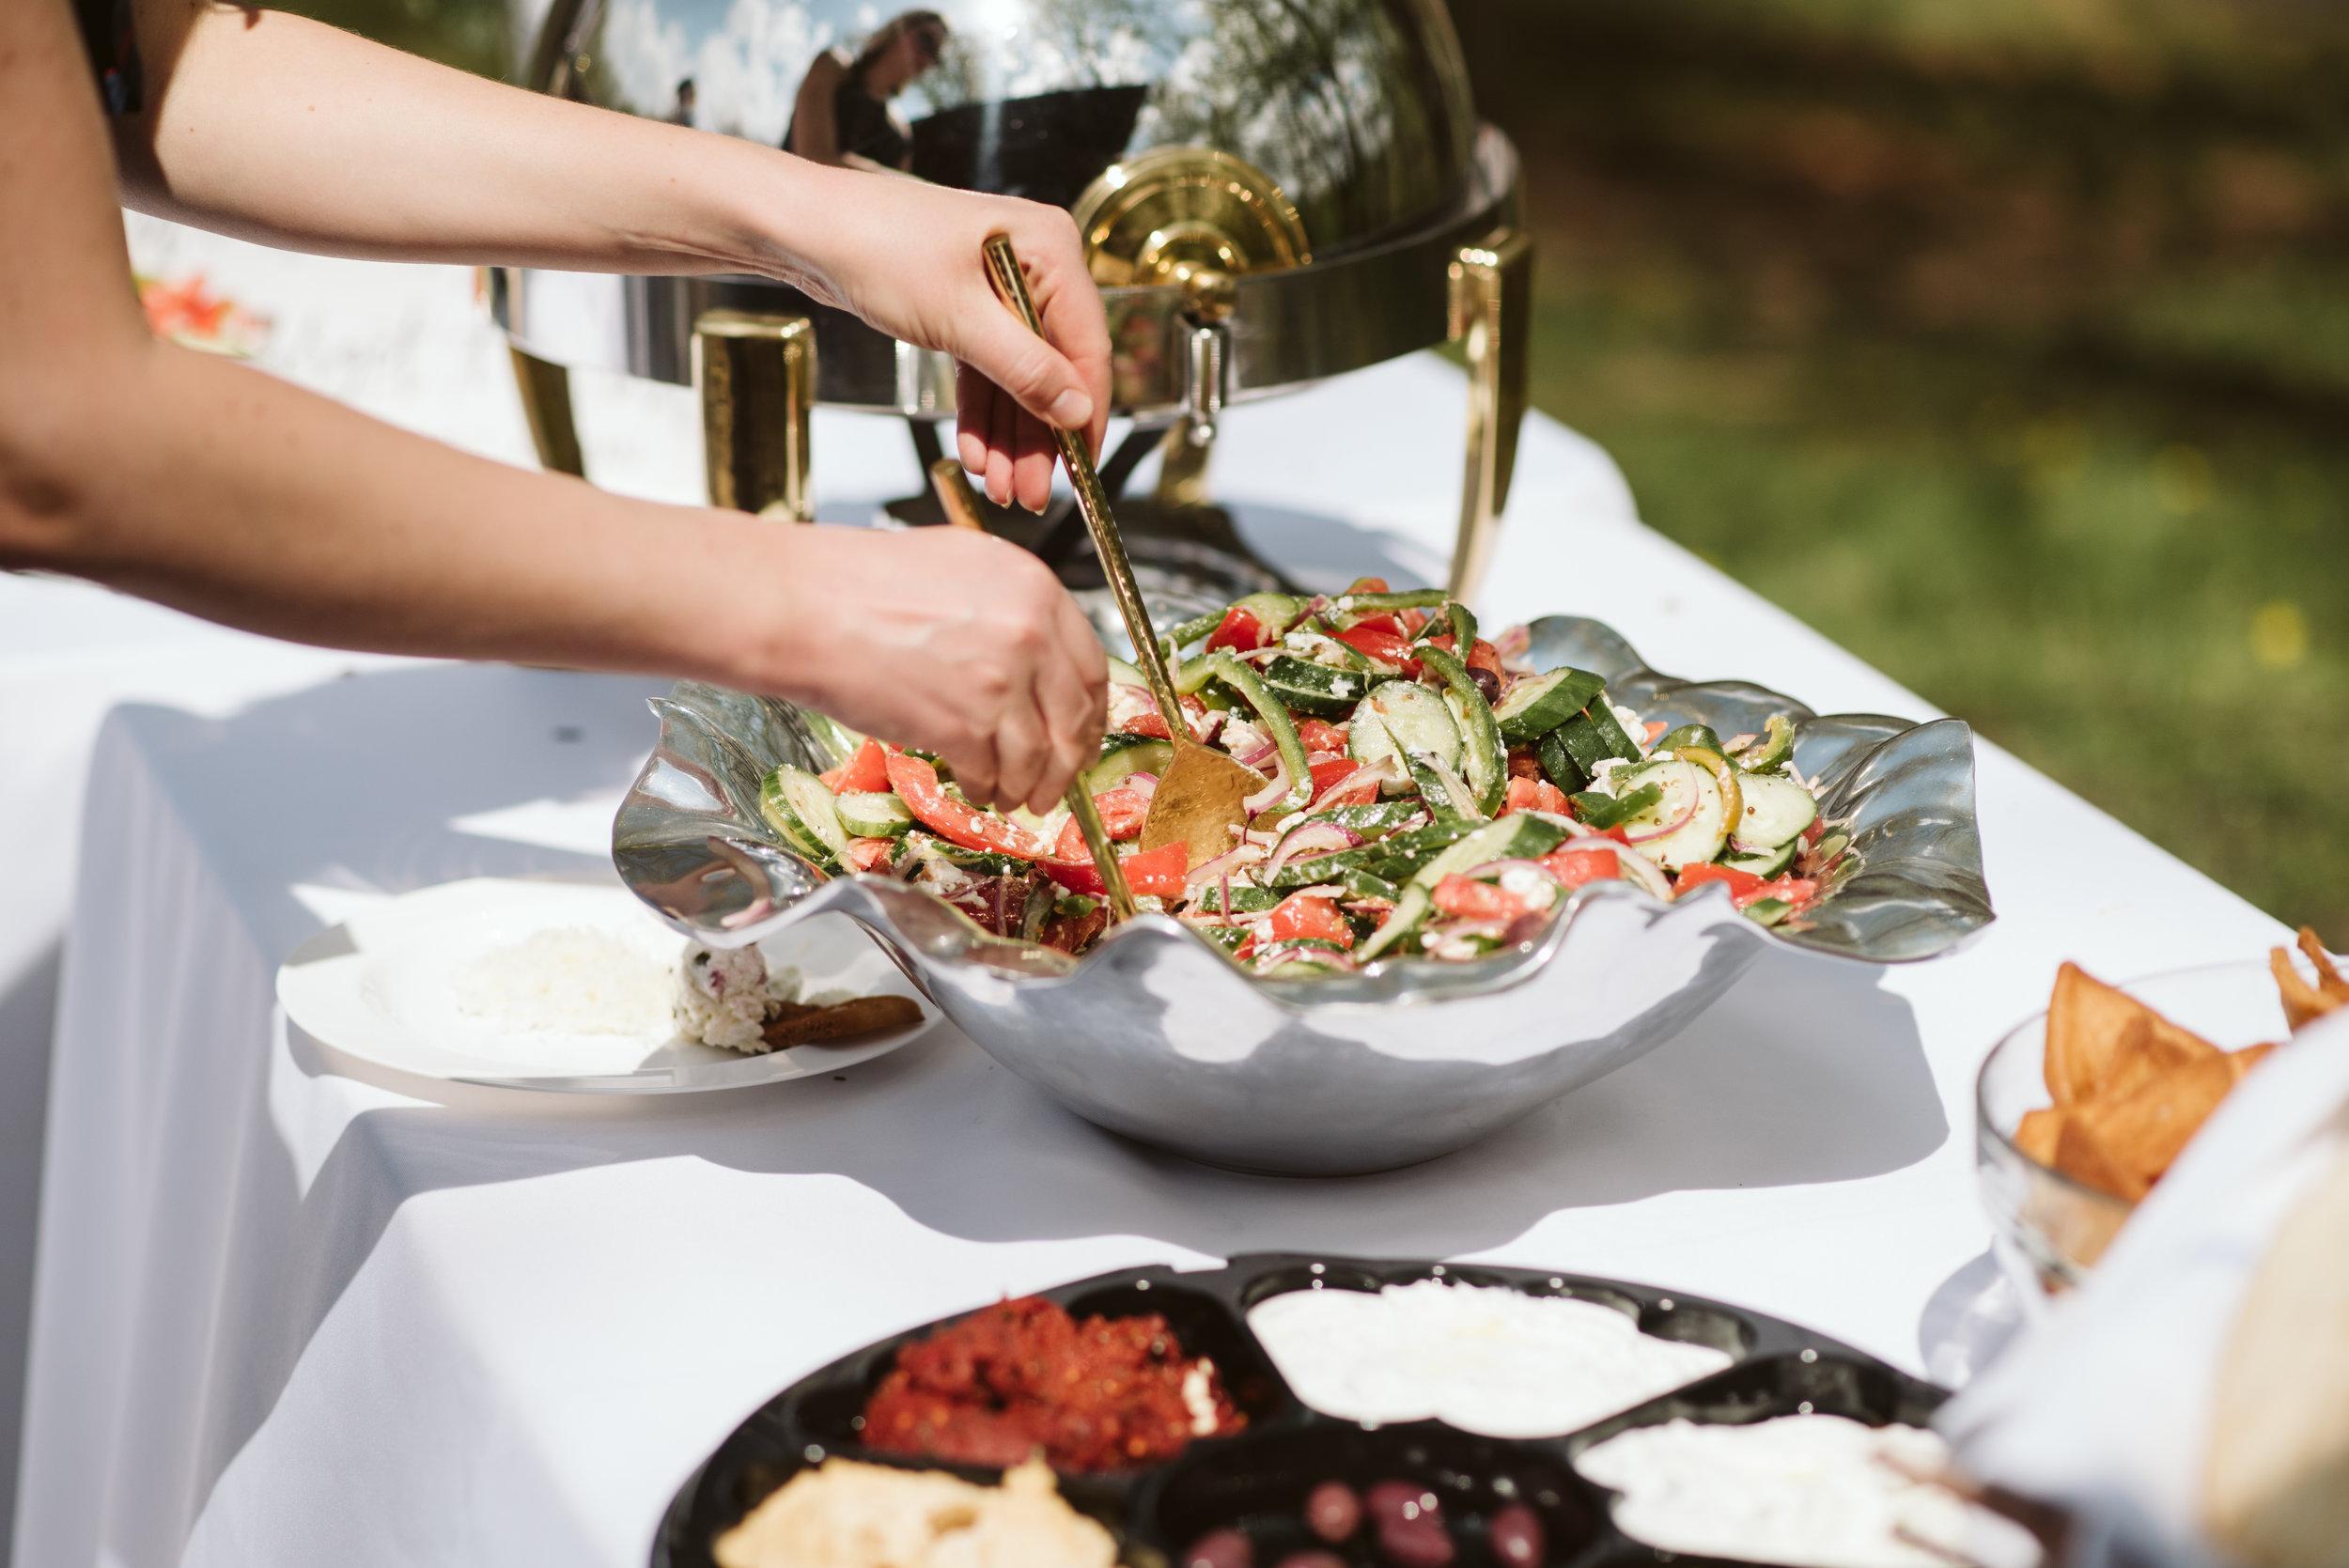 Spring Outdoor Wedding, Park, Baltimore Wedding Photographer, DIY, Classic, Upcycled, Garden Party, Romantic, Cava Mezze Caterer, Reception Food